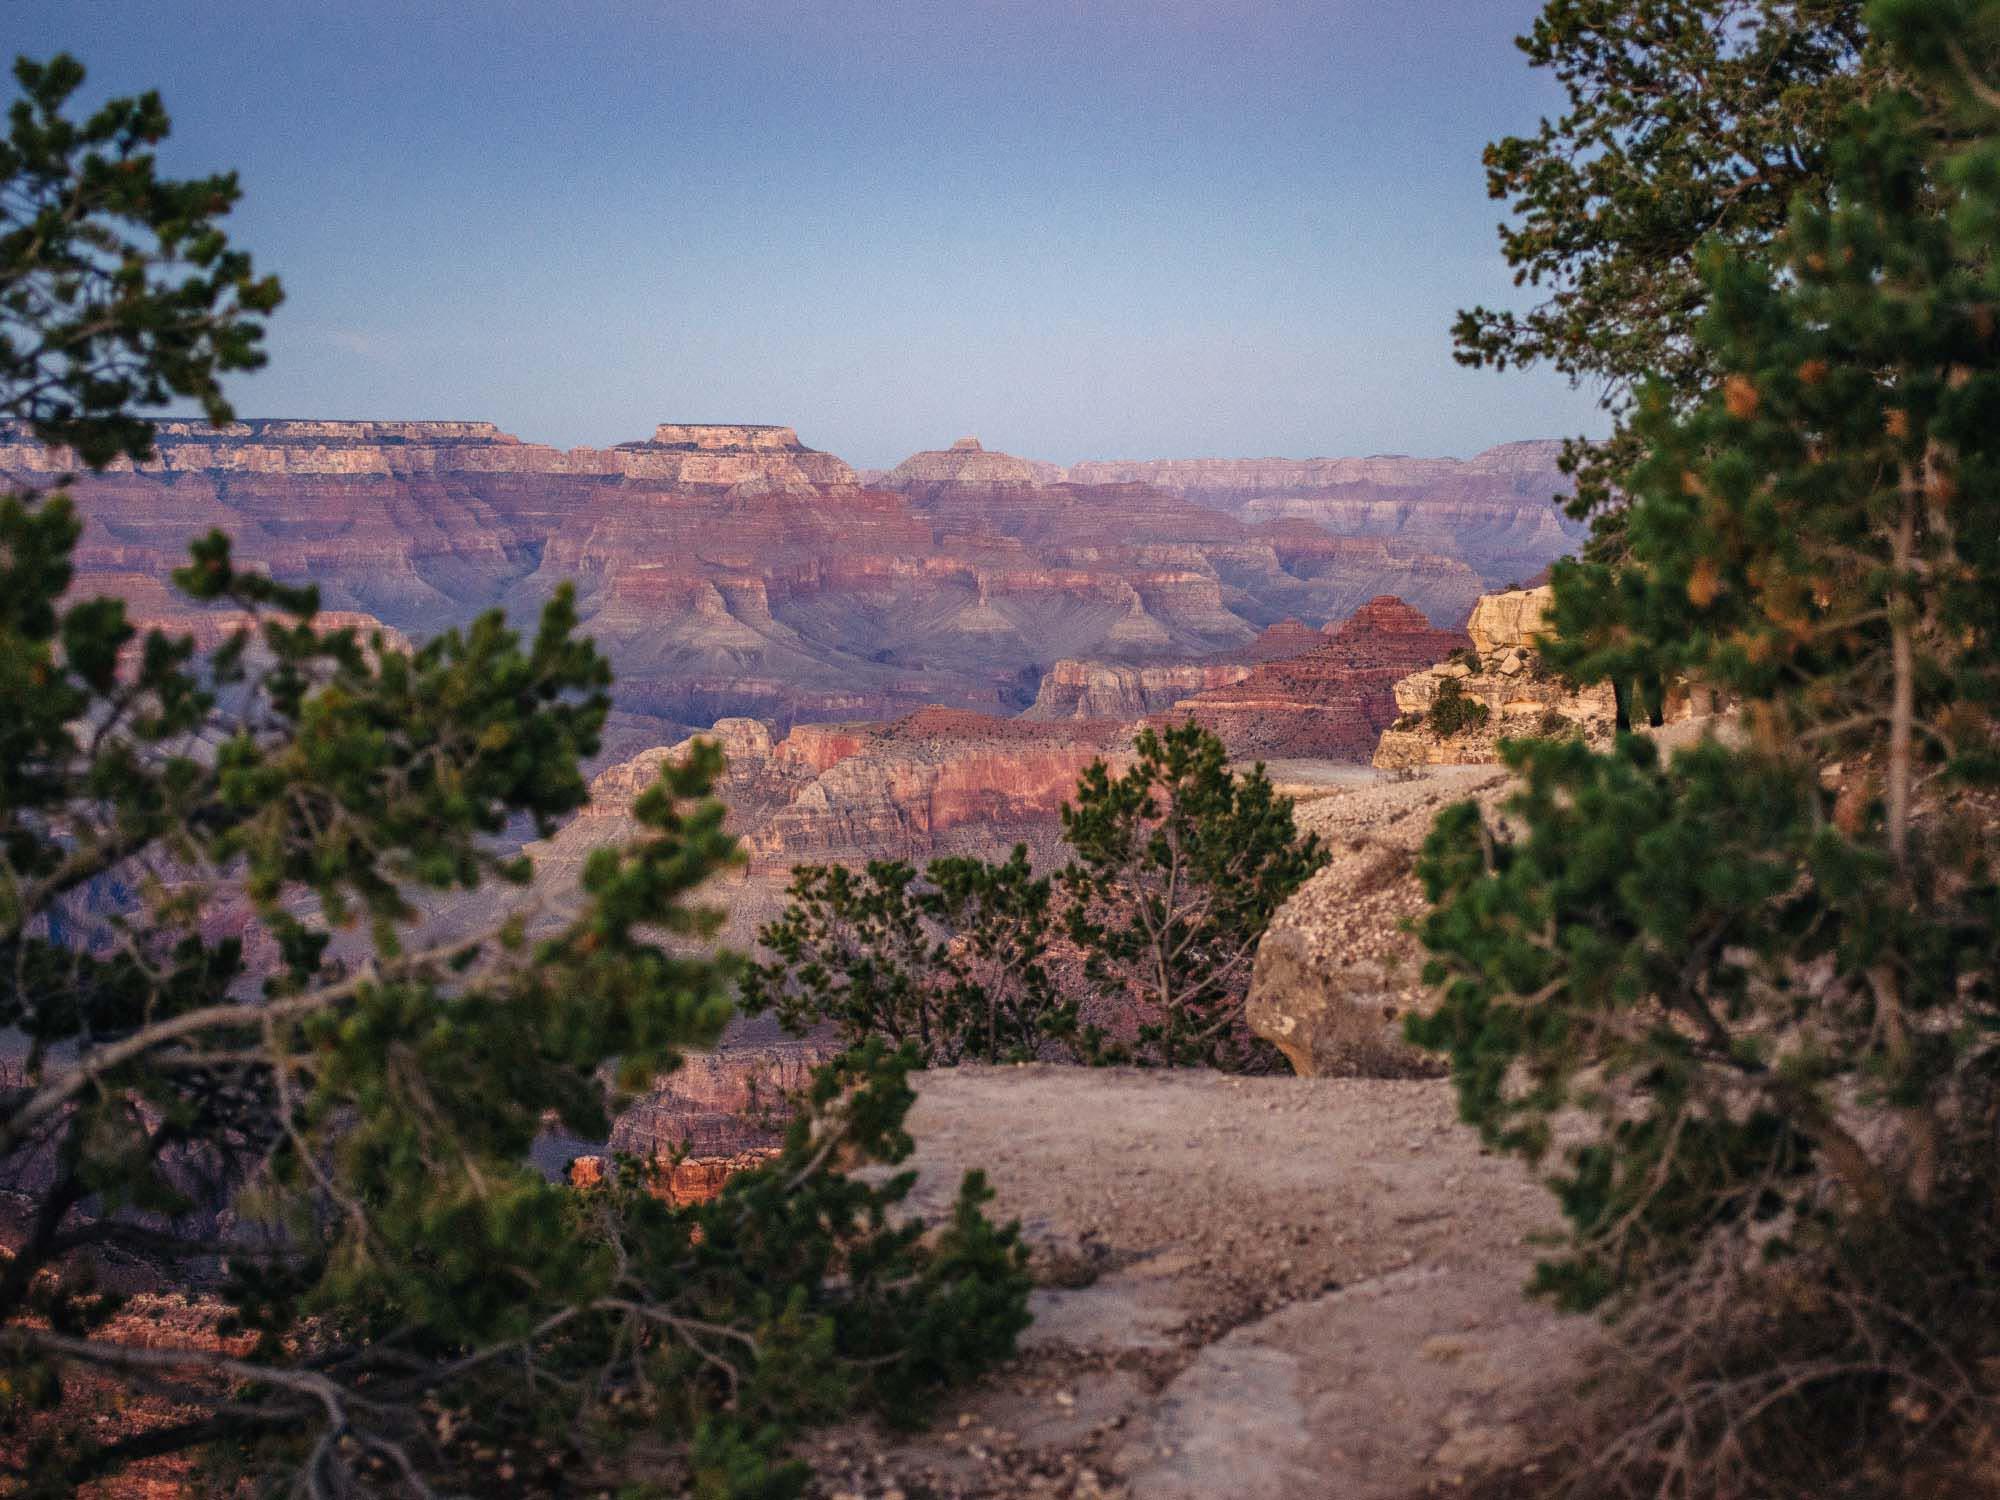 Grand Canyon after sunset, USA.